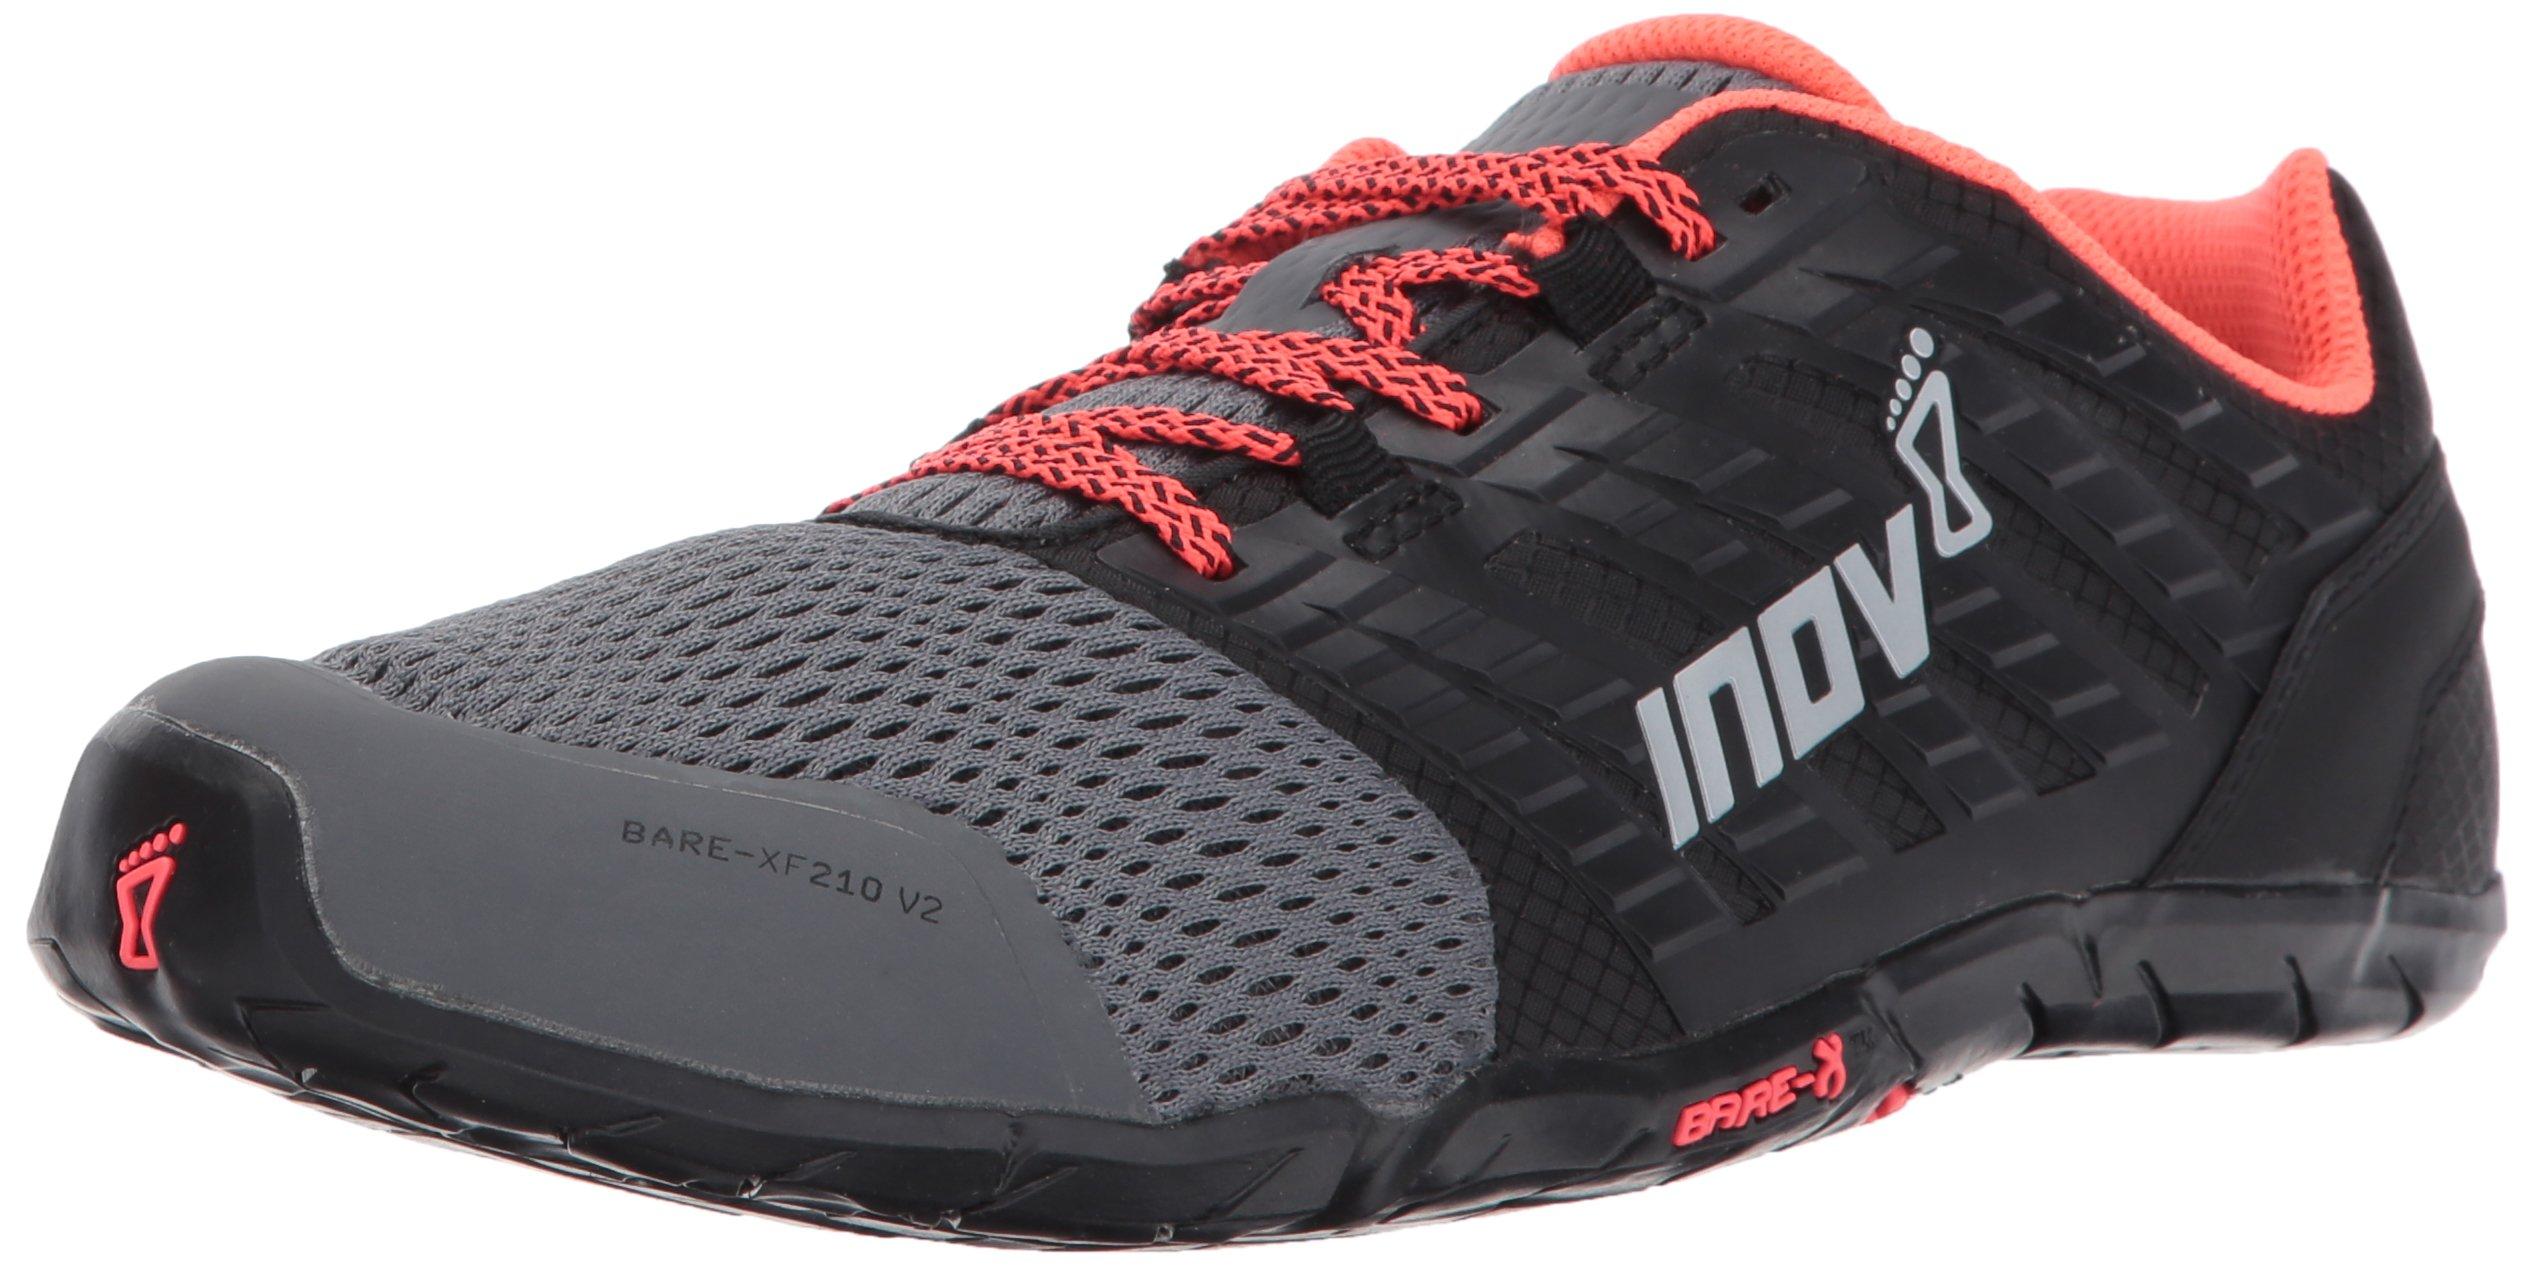 Inov-8 Women's Bare-XF 210 v2 (W) Cross Trainer, Grey/Black/Coral, 7.5 B US